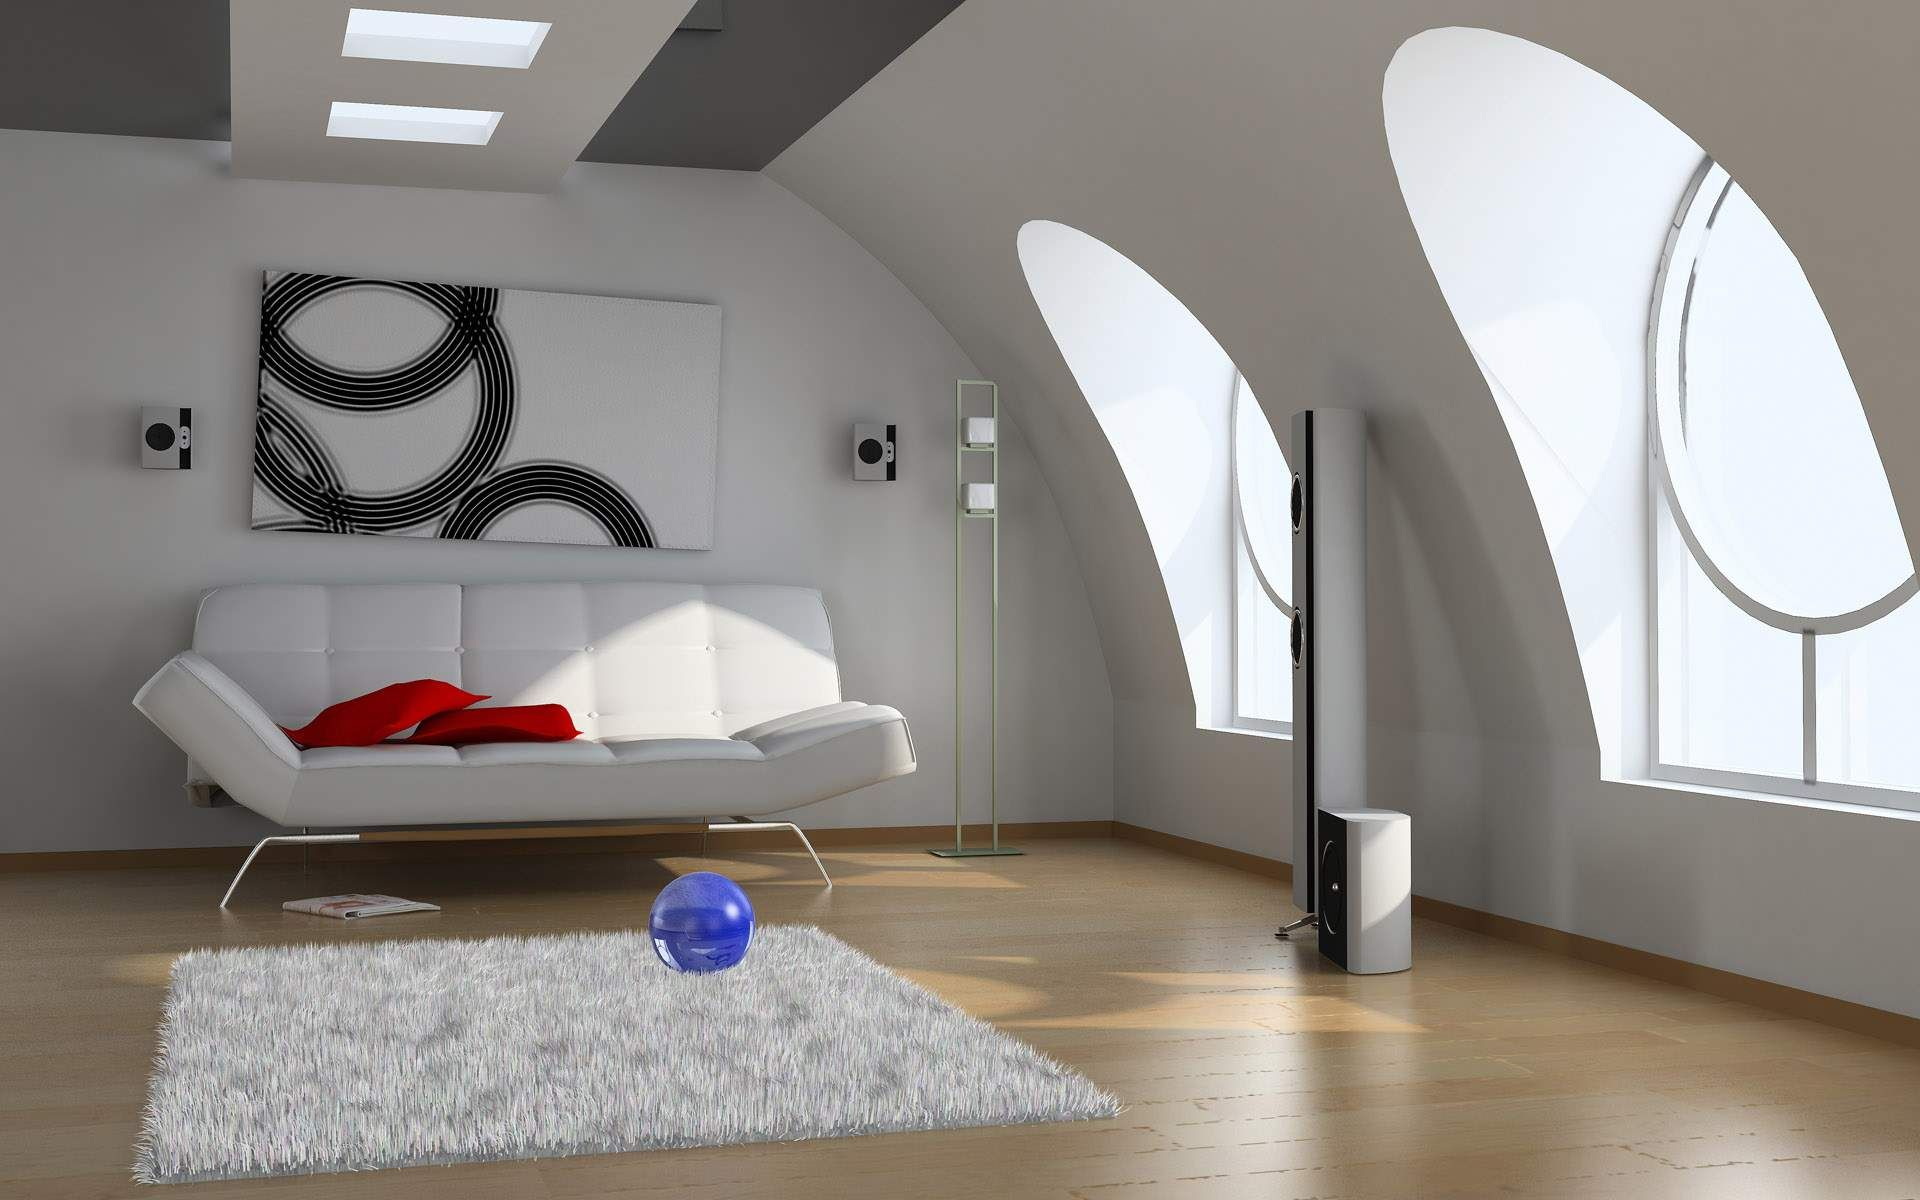 Interior Design Living Room With Unique Shape Windows Image